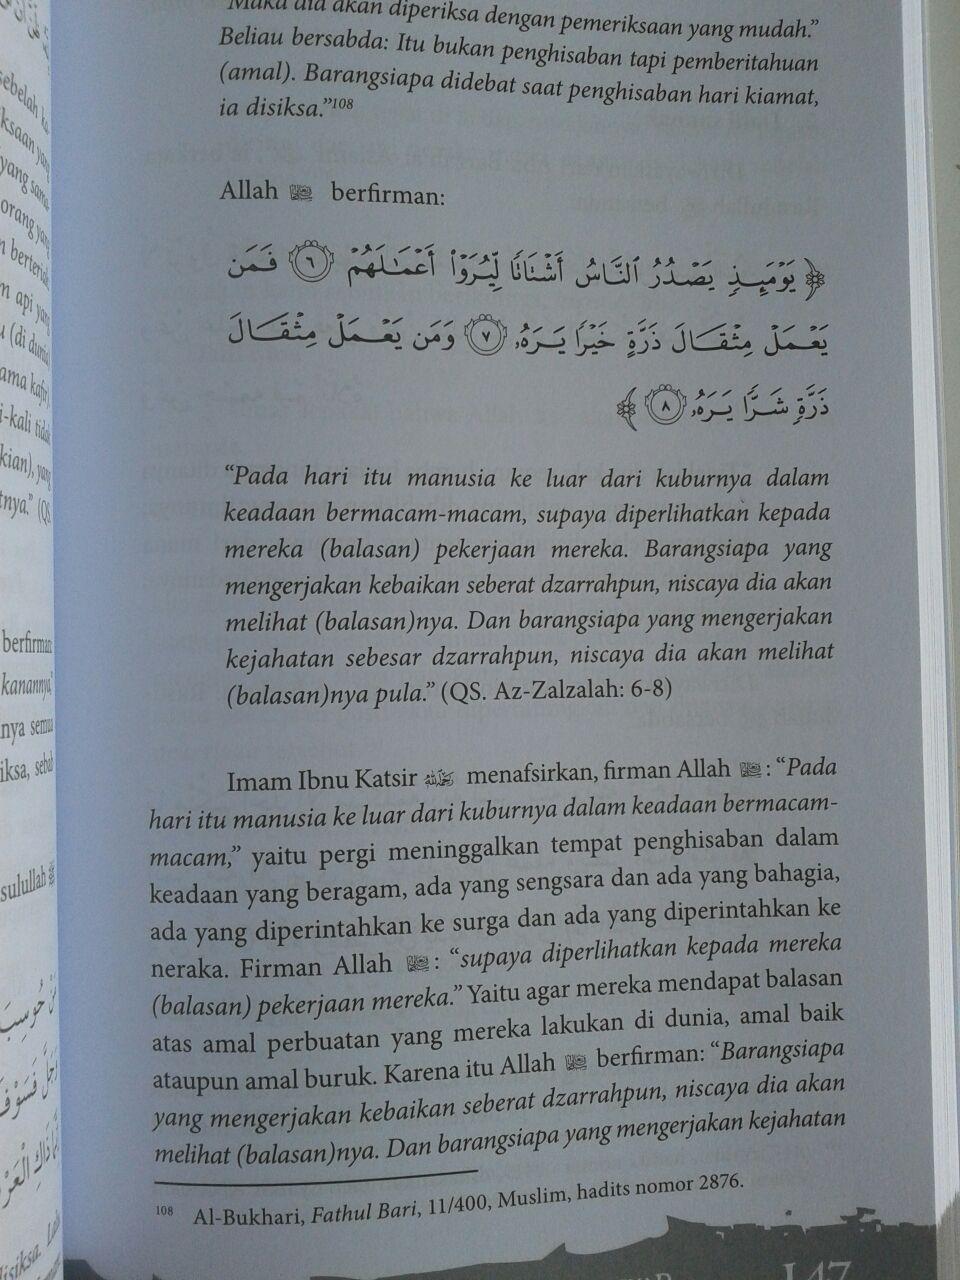 Buku Prahara Padang Mahsyar (Seri 2 Trilogi Alam Akhirat) isi